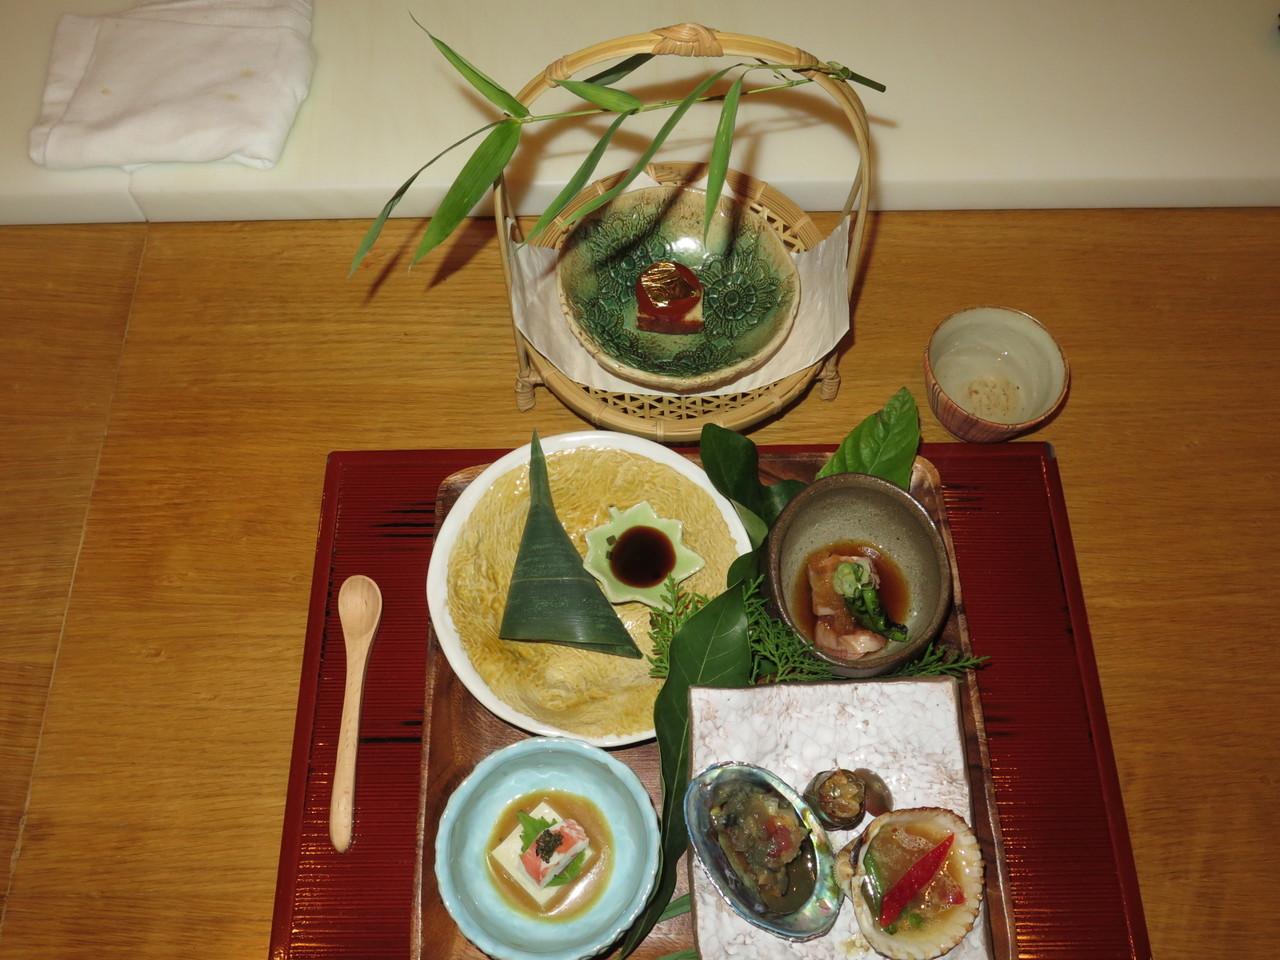 Sasamiaki Renkonmochi, Goma Doufu, Kamo Mizoreae, Akagai Bata-Yaki, Ougon Tamago, Sake Tsukasabotan (Kochi)